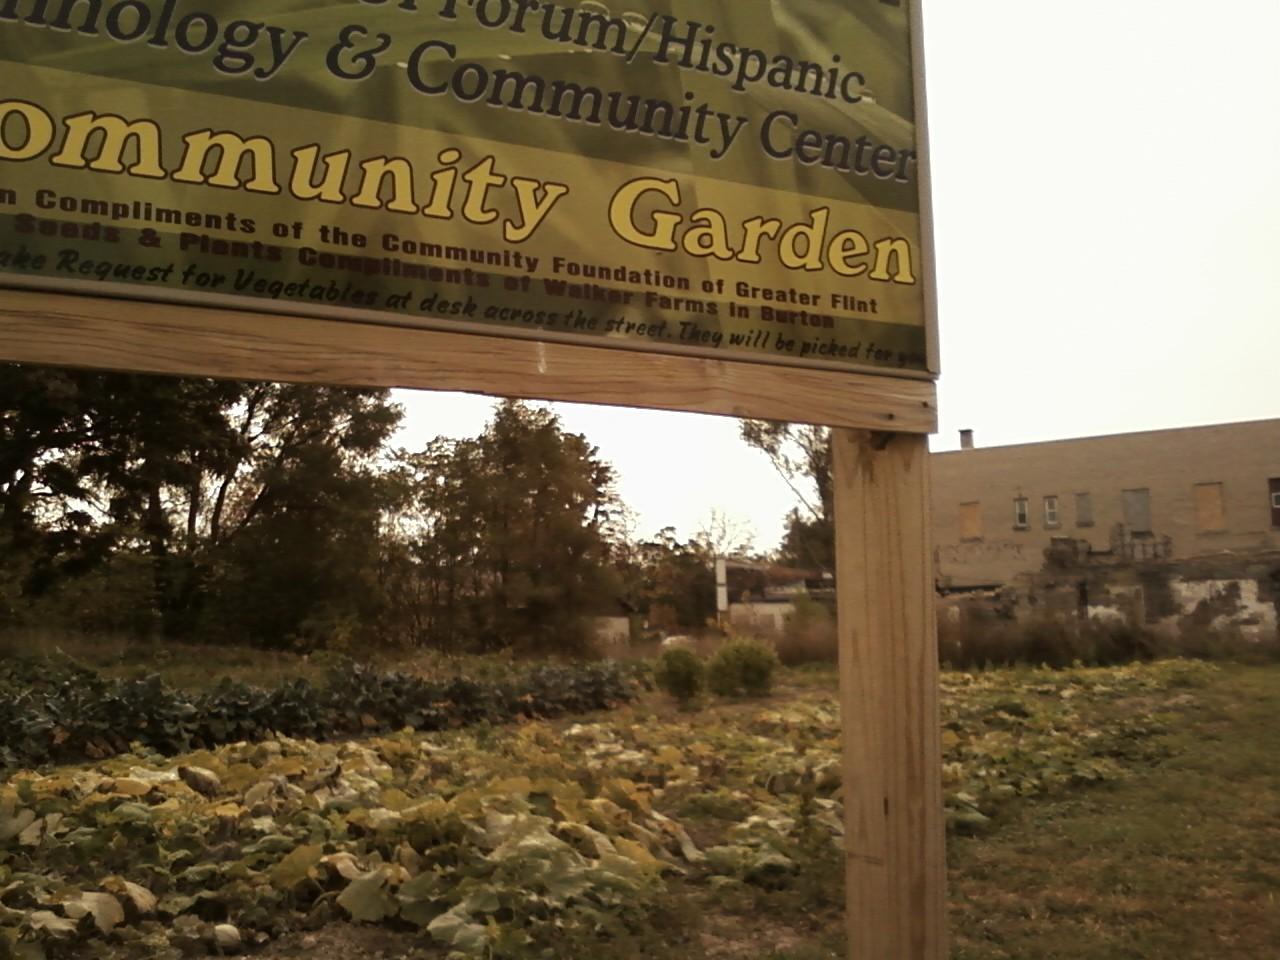 Colorful Olive Garden Flint Mi Motif - Brown Nature Garden ...